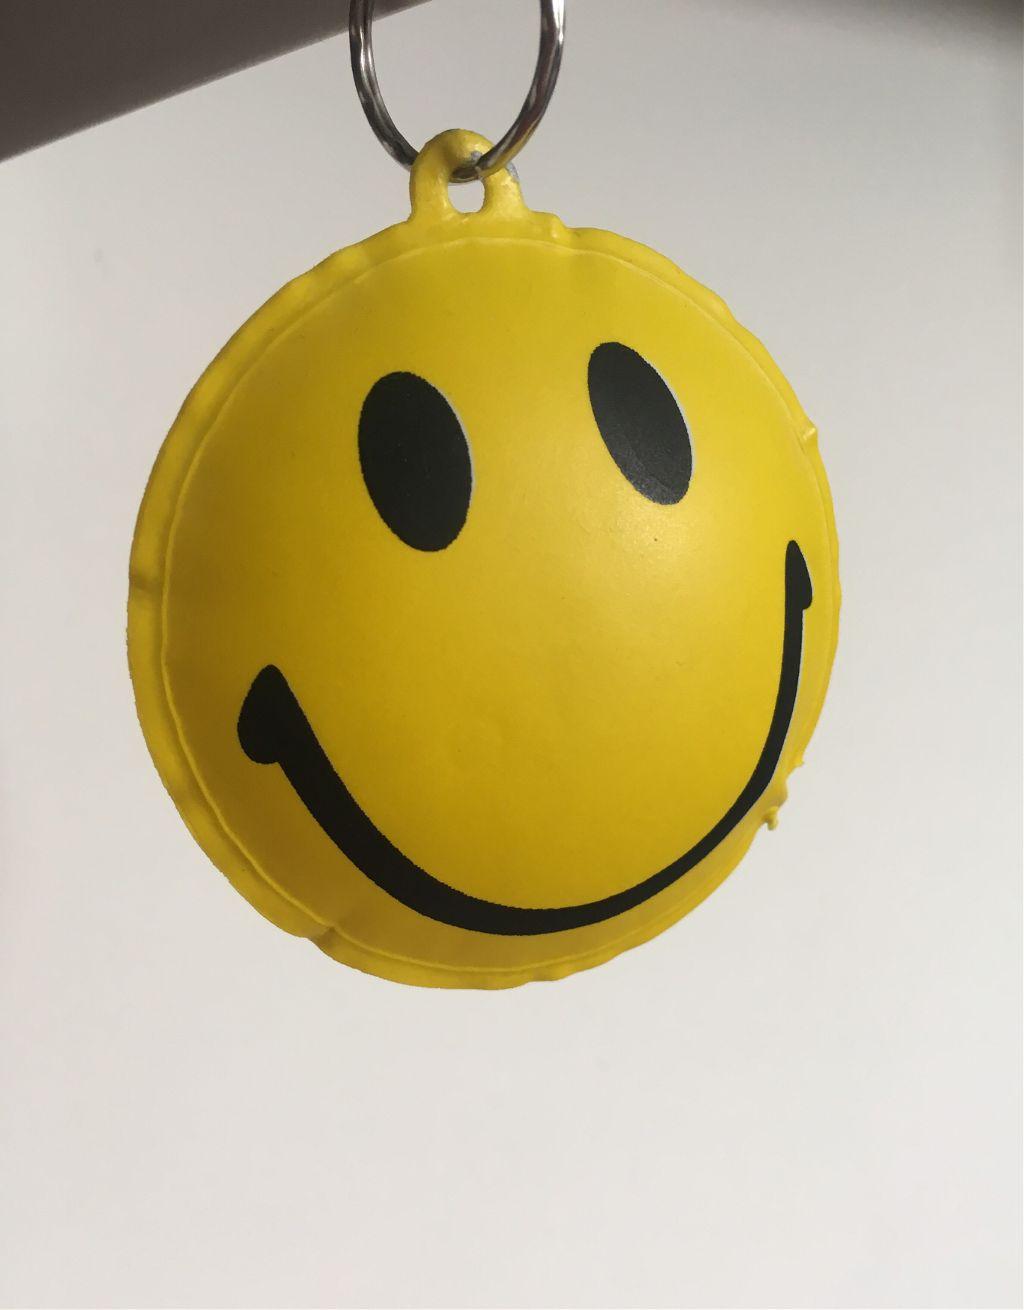 #smile #yellow #still